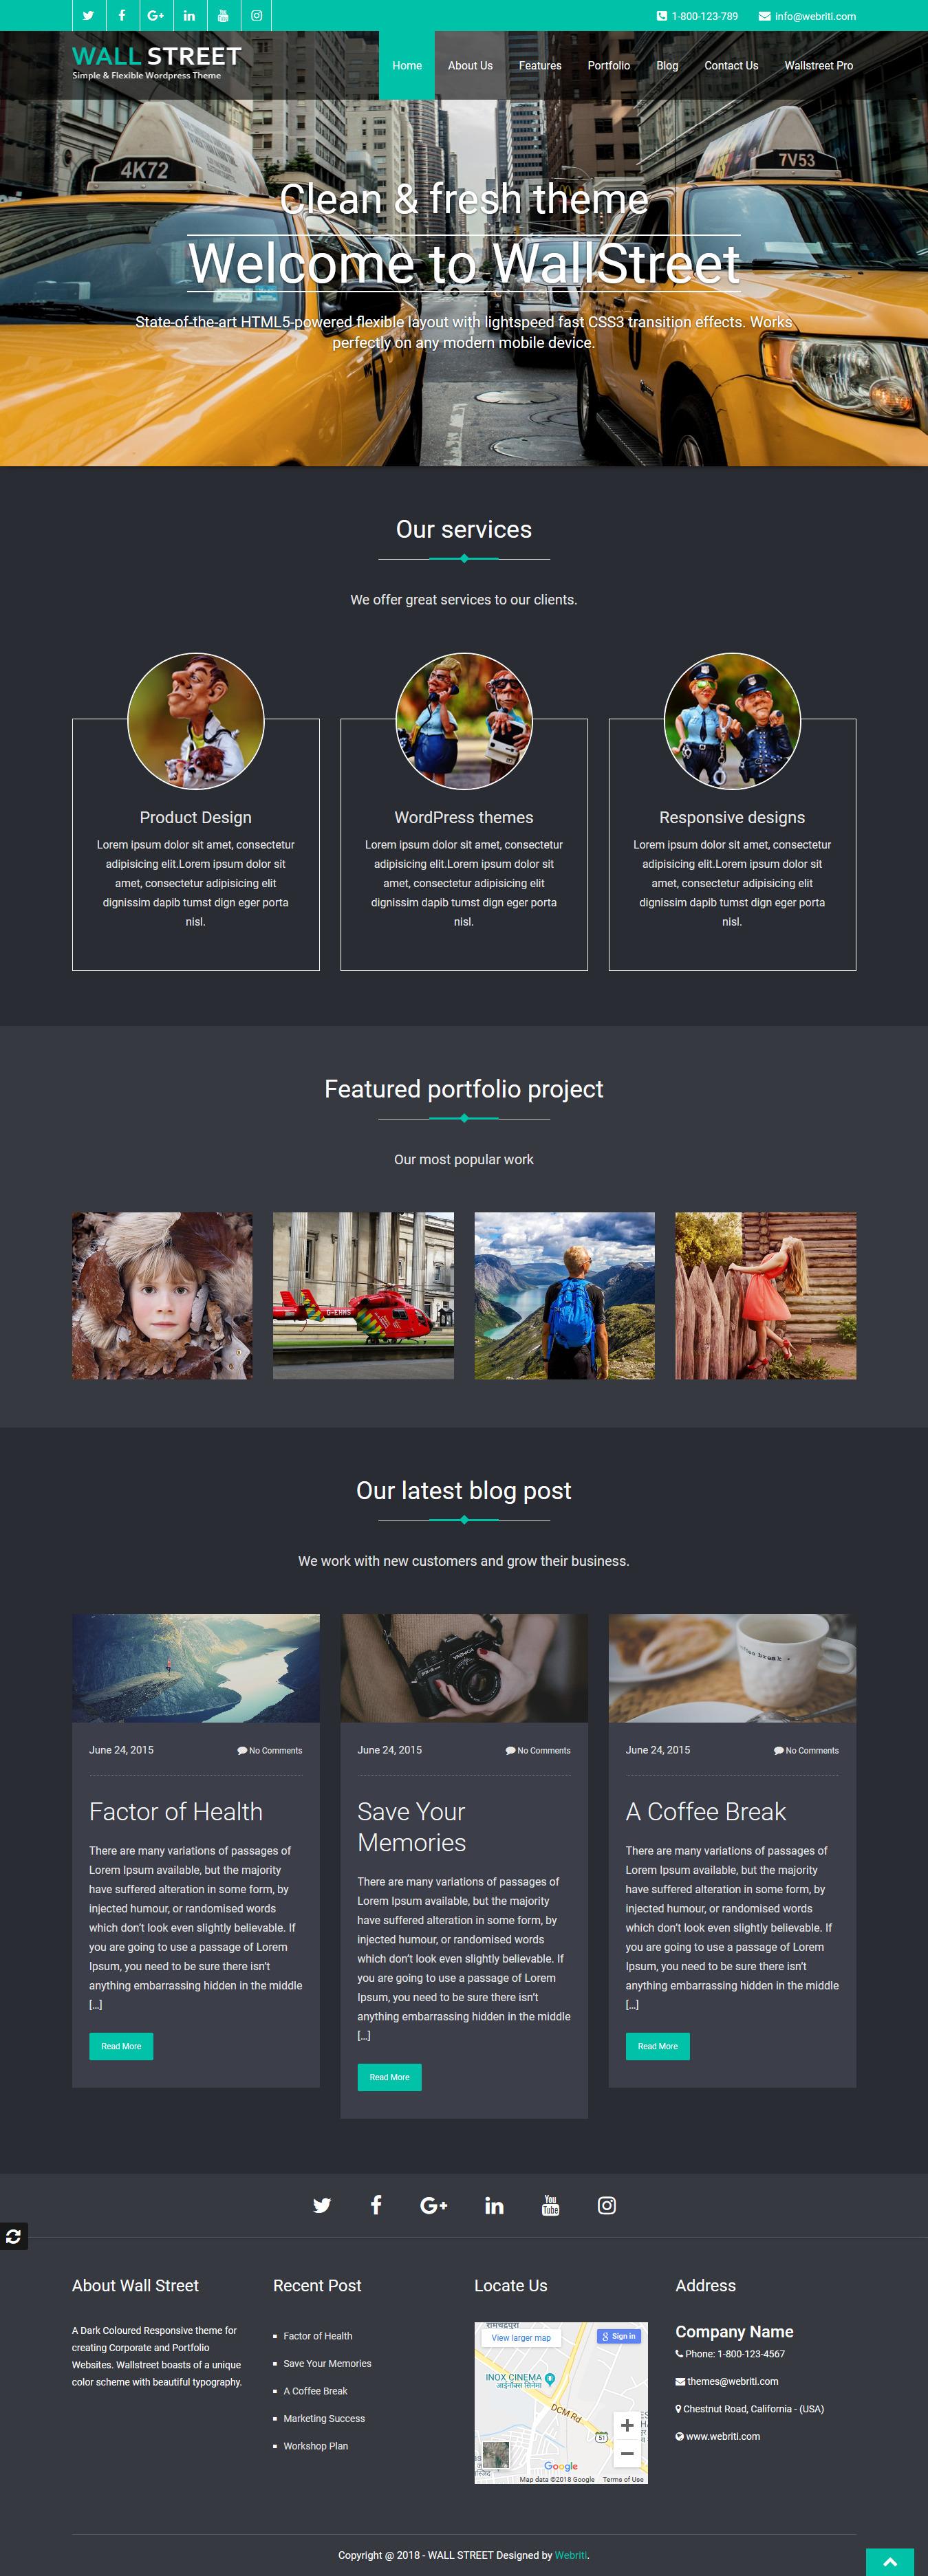 wallstreet best free architecture wordpress theme - 10+ Best Free Architecture WordPress Themes